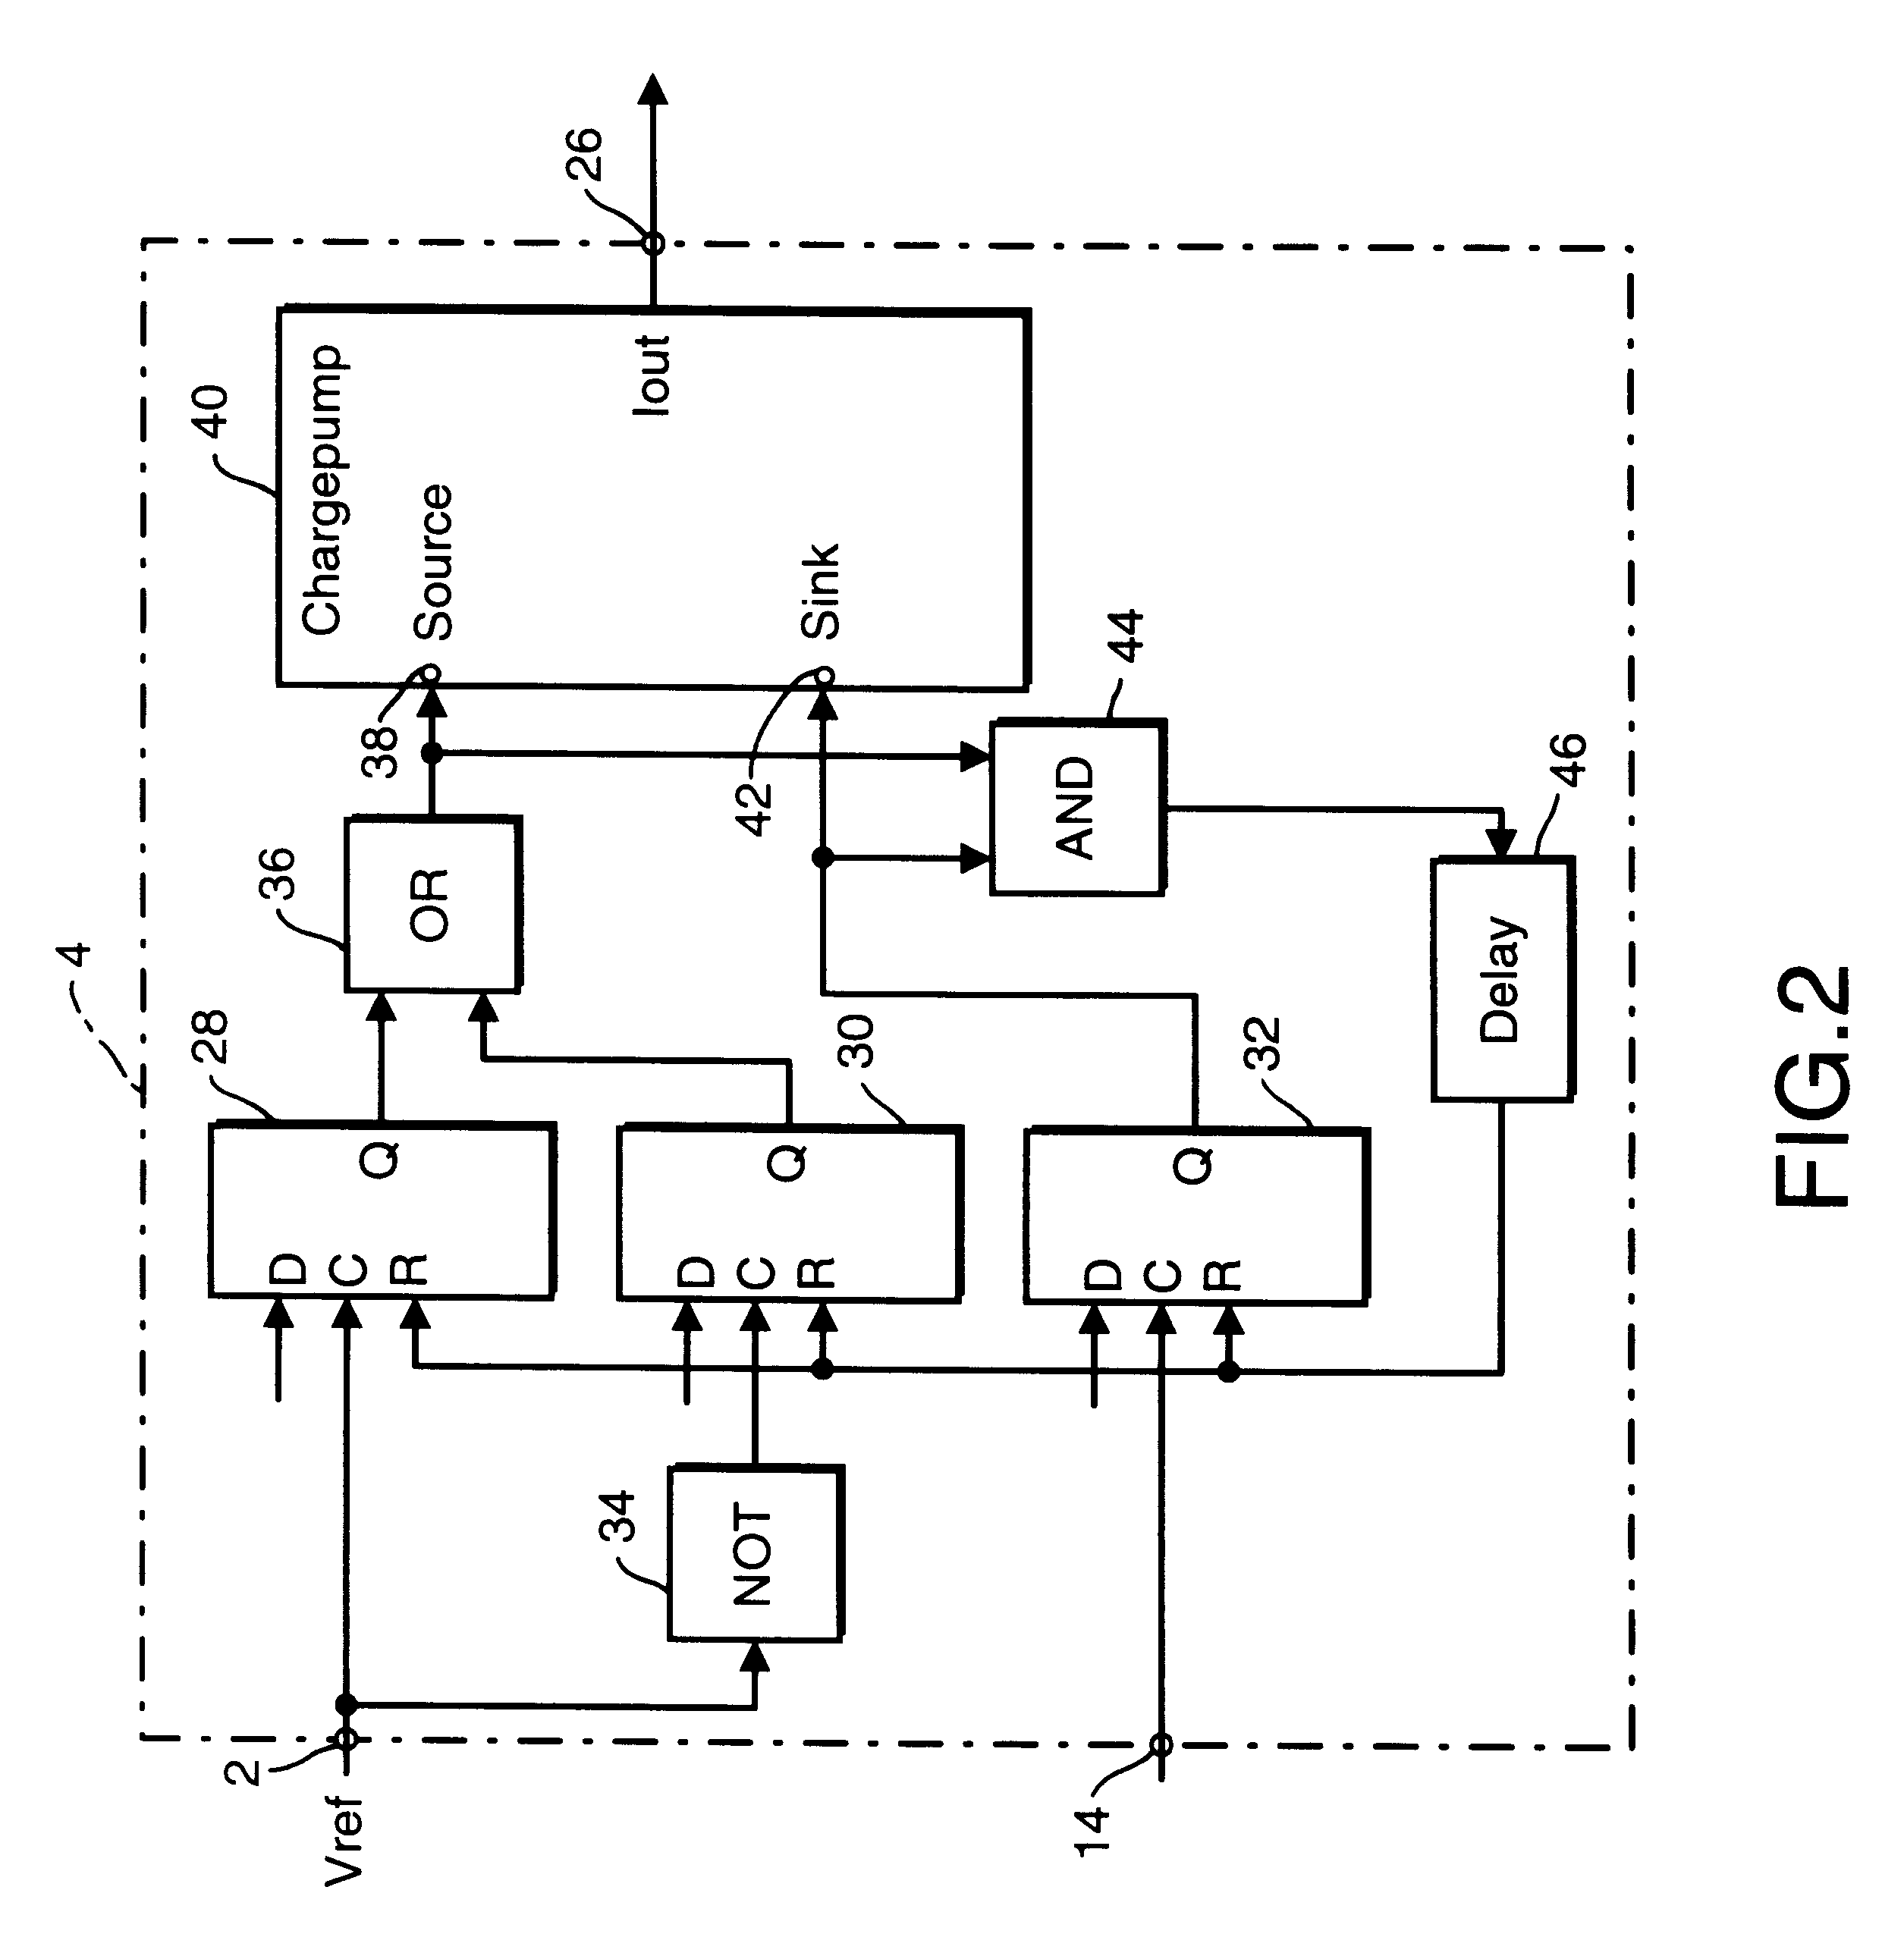 Clock Edge Detector Circuit Electrical Work Wiring Diagram Dark Phase Sensors And Detectors Circuits Electronics Tutorial Readingrat Net Light